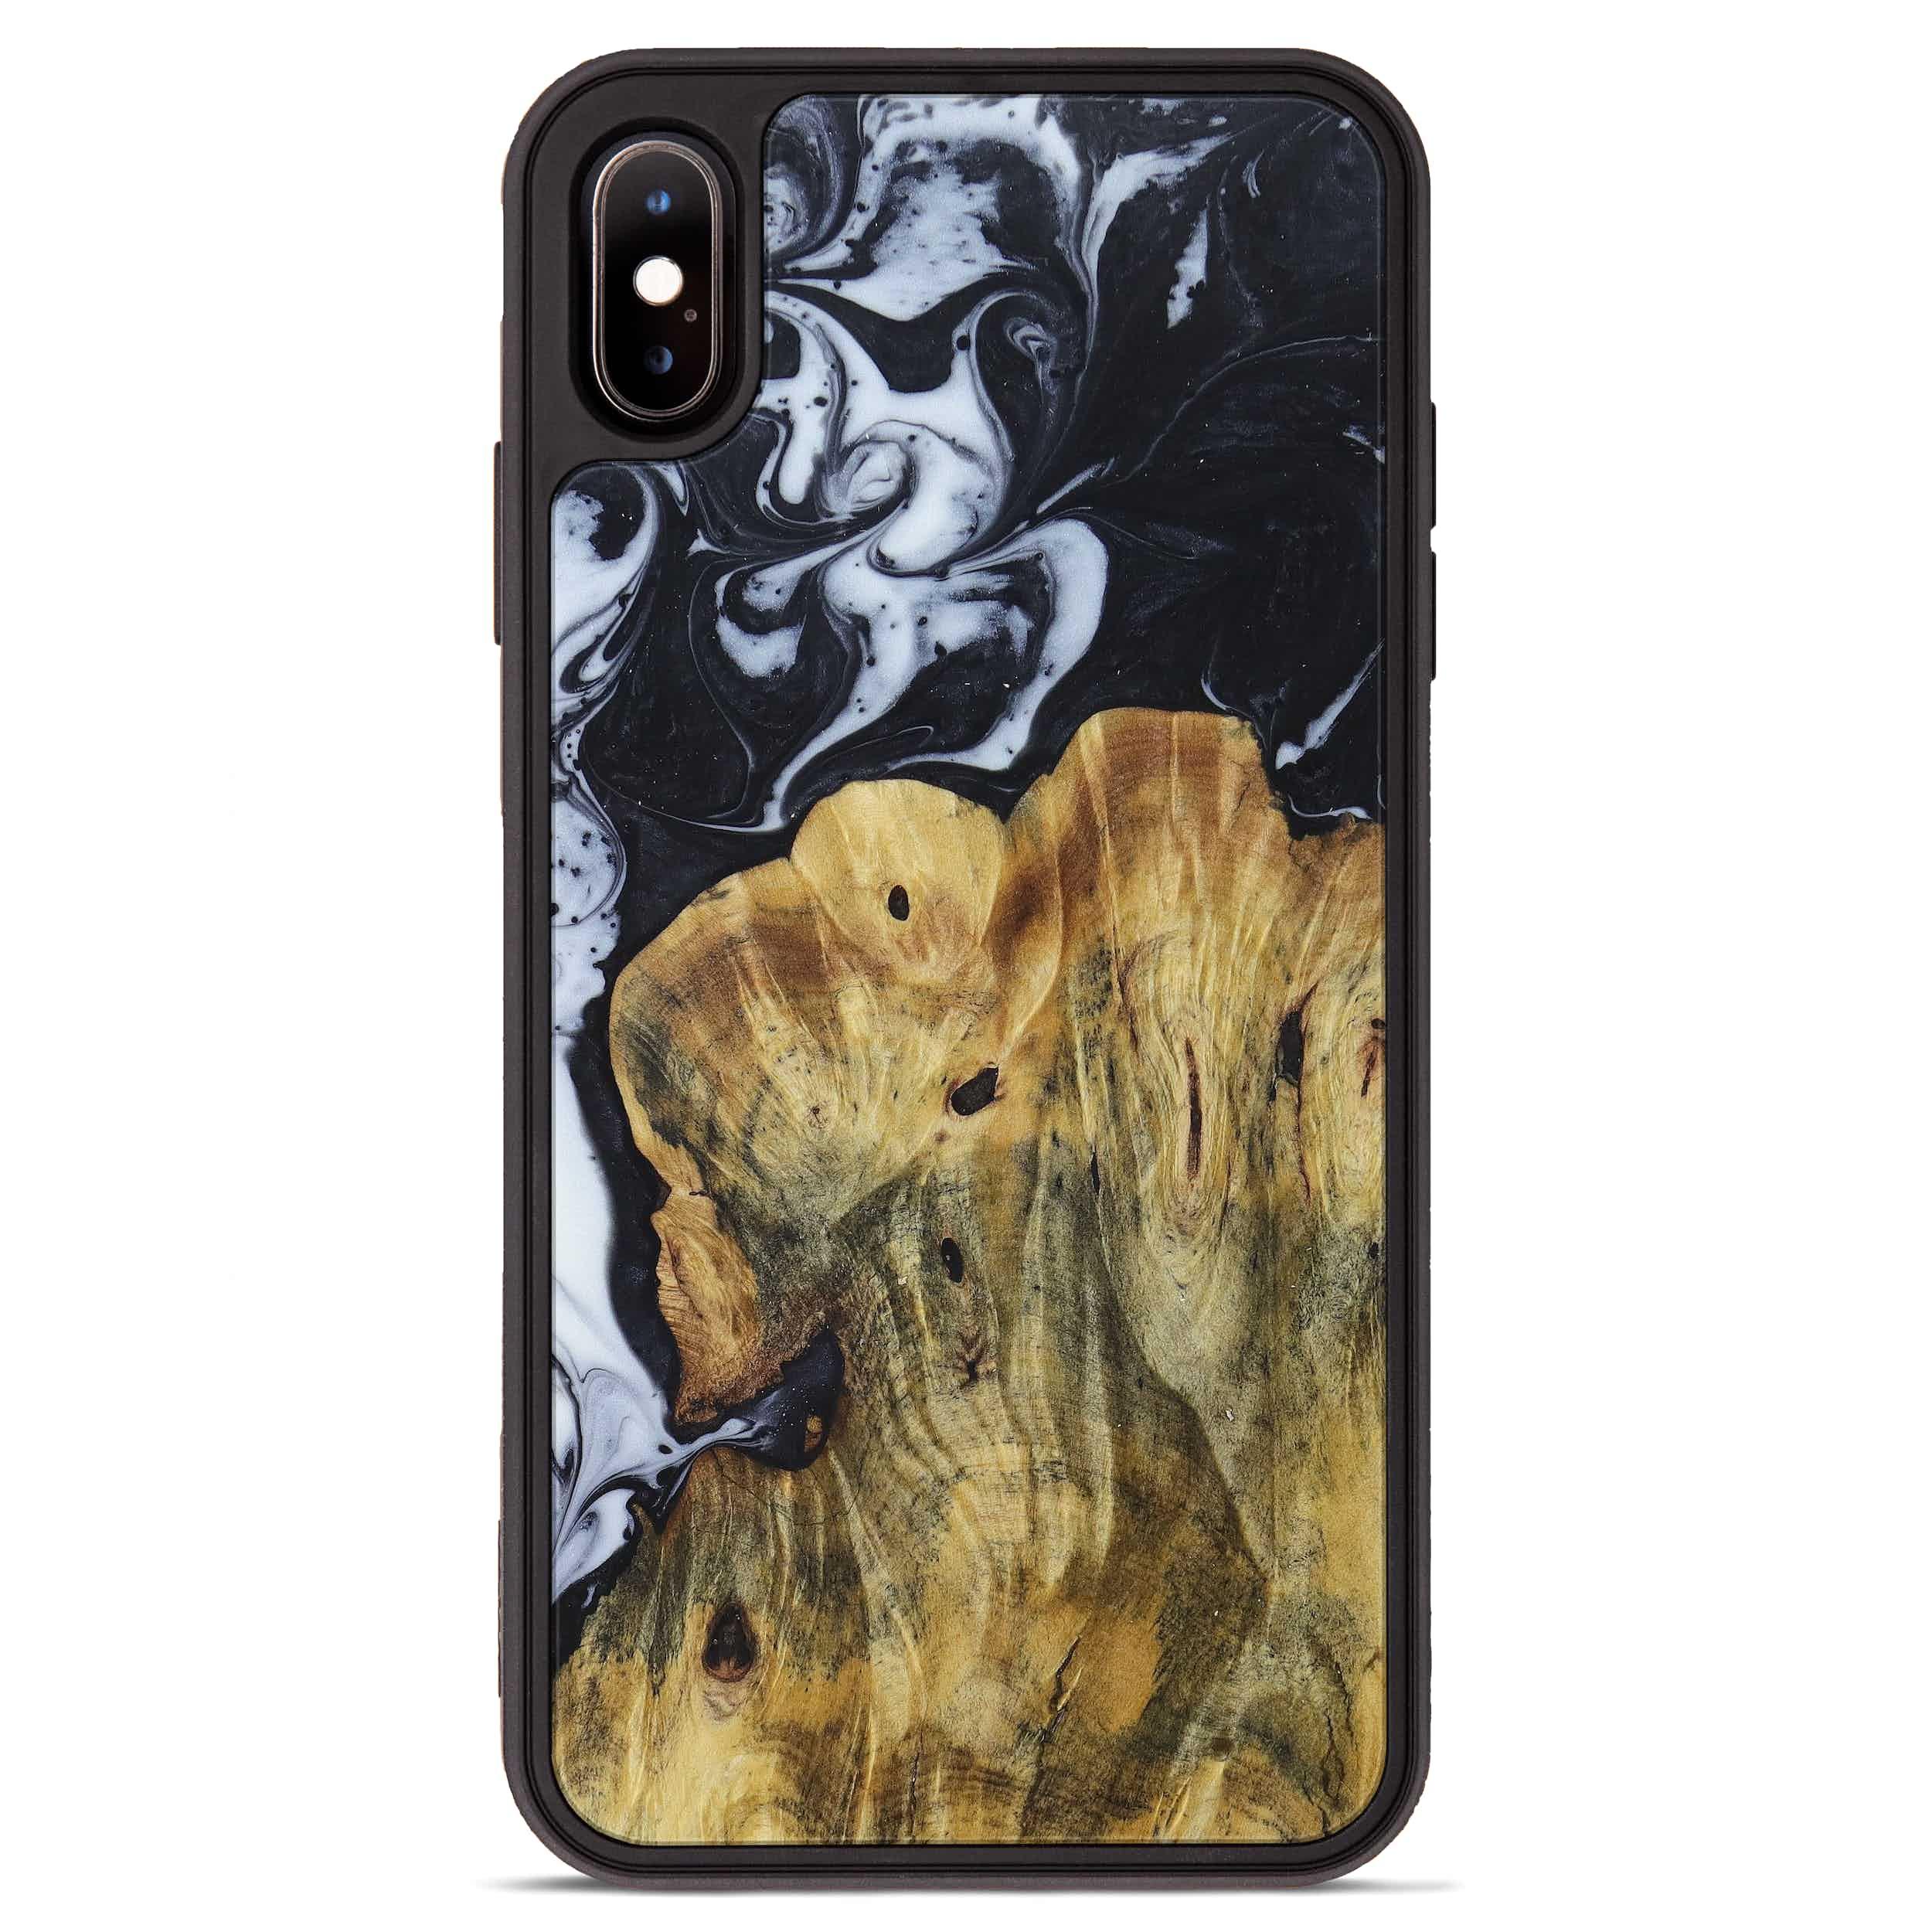 iPhone Xs Max Wood+Resin Phone Case - Fedora (Black & White, 397355)